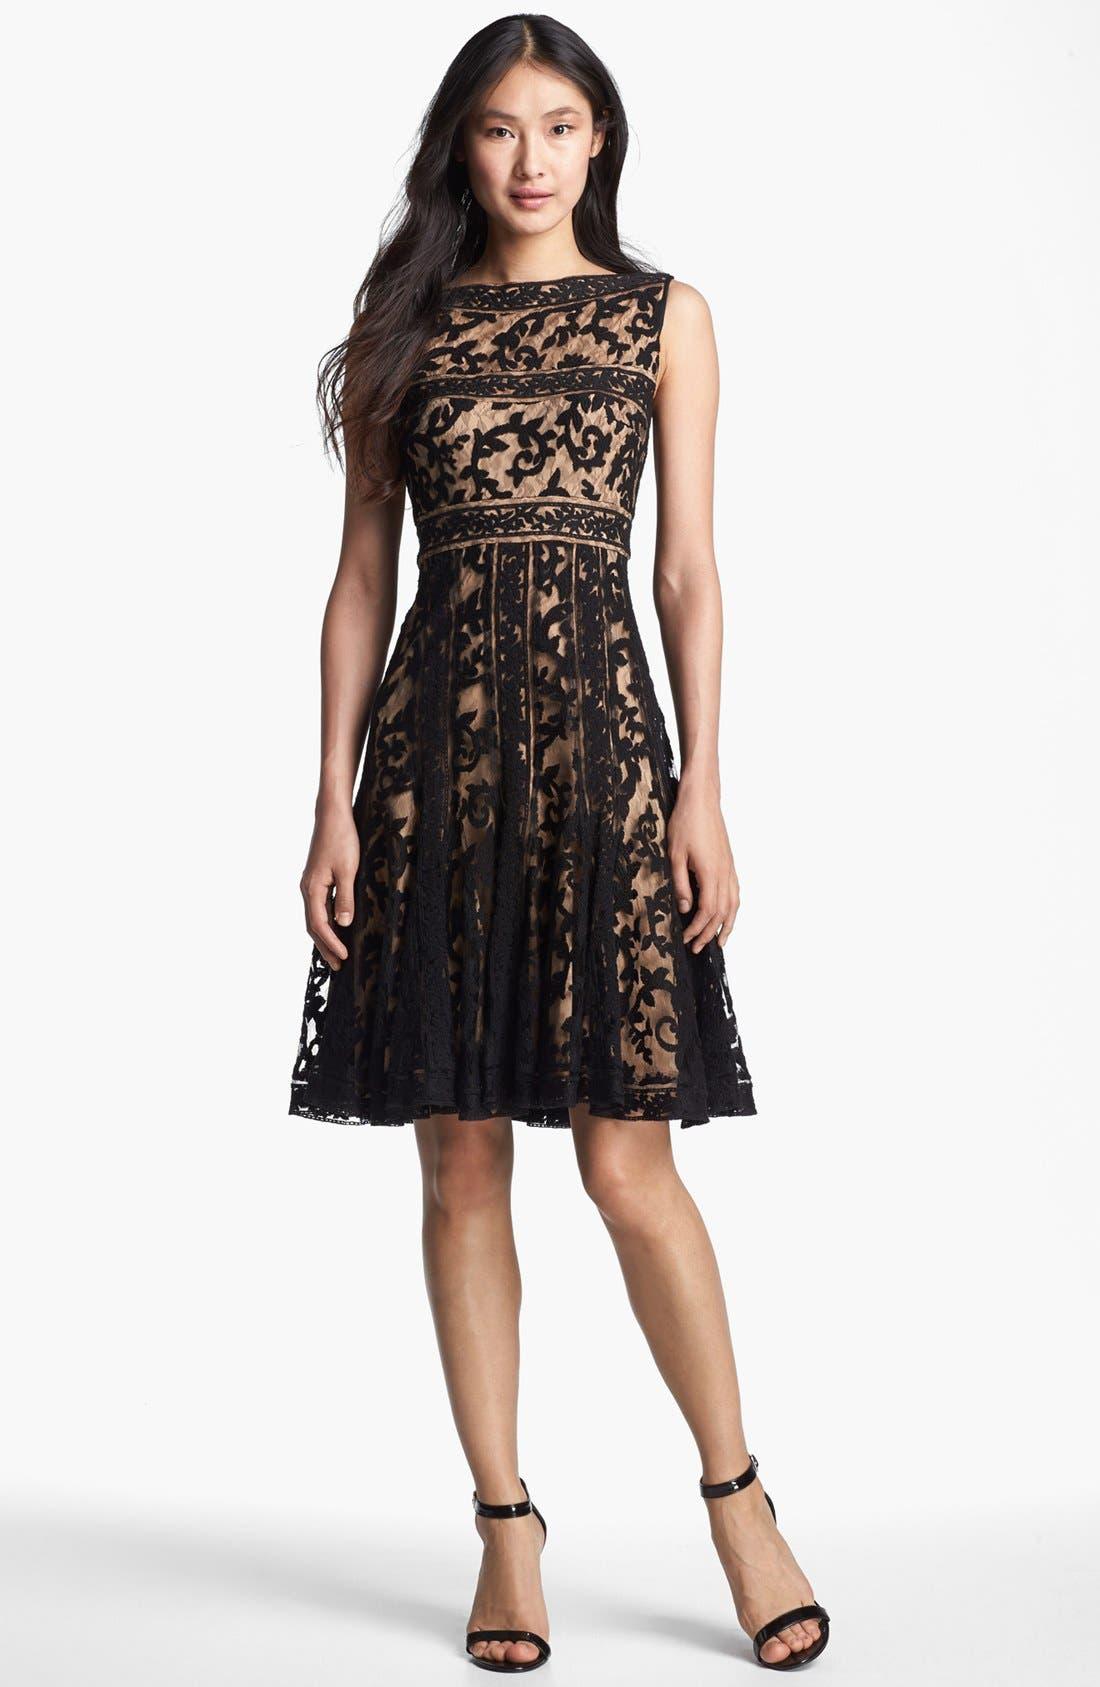 Alternate Image 1 Selected - Tadashi Shoji Embroidered Lace Fit & Flare Dress